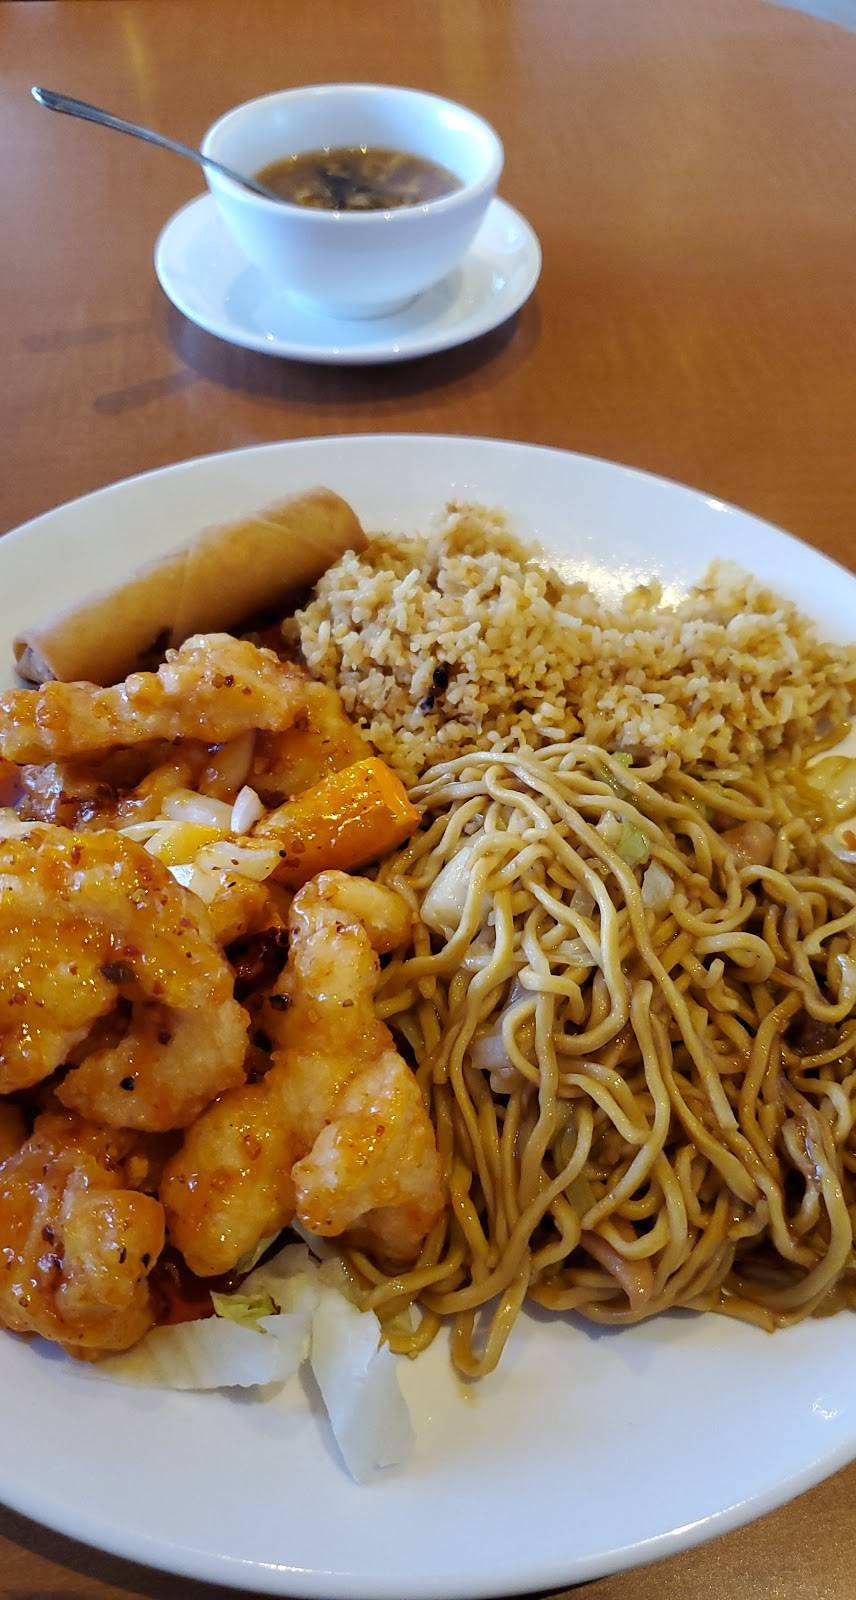 California Wok and Grill | restaurant | 9080 Laguna Main St, Elk Grove, CA 95758, USA | 9168952444 OR +1 916-895-2444